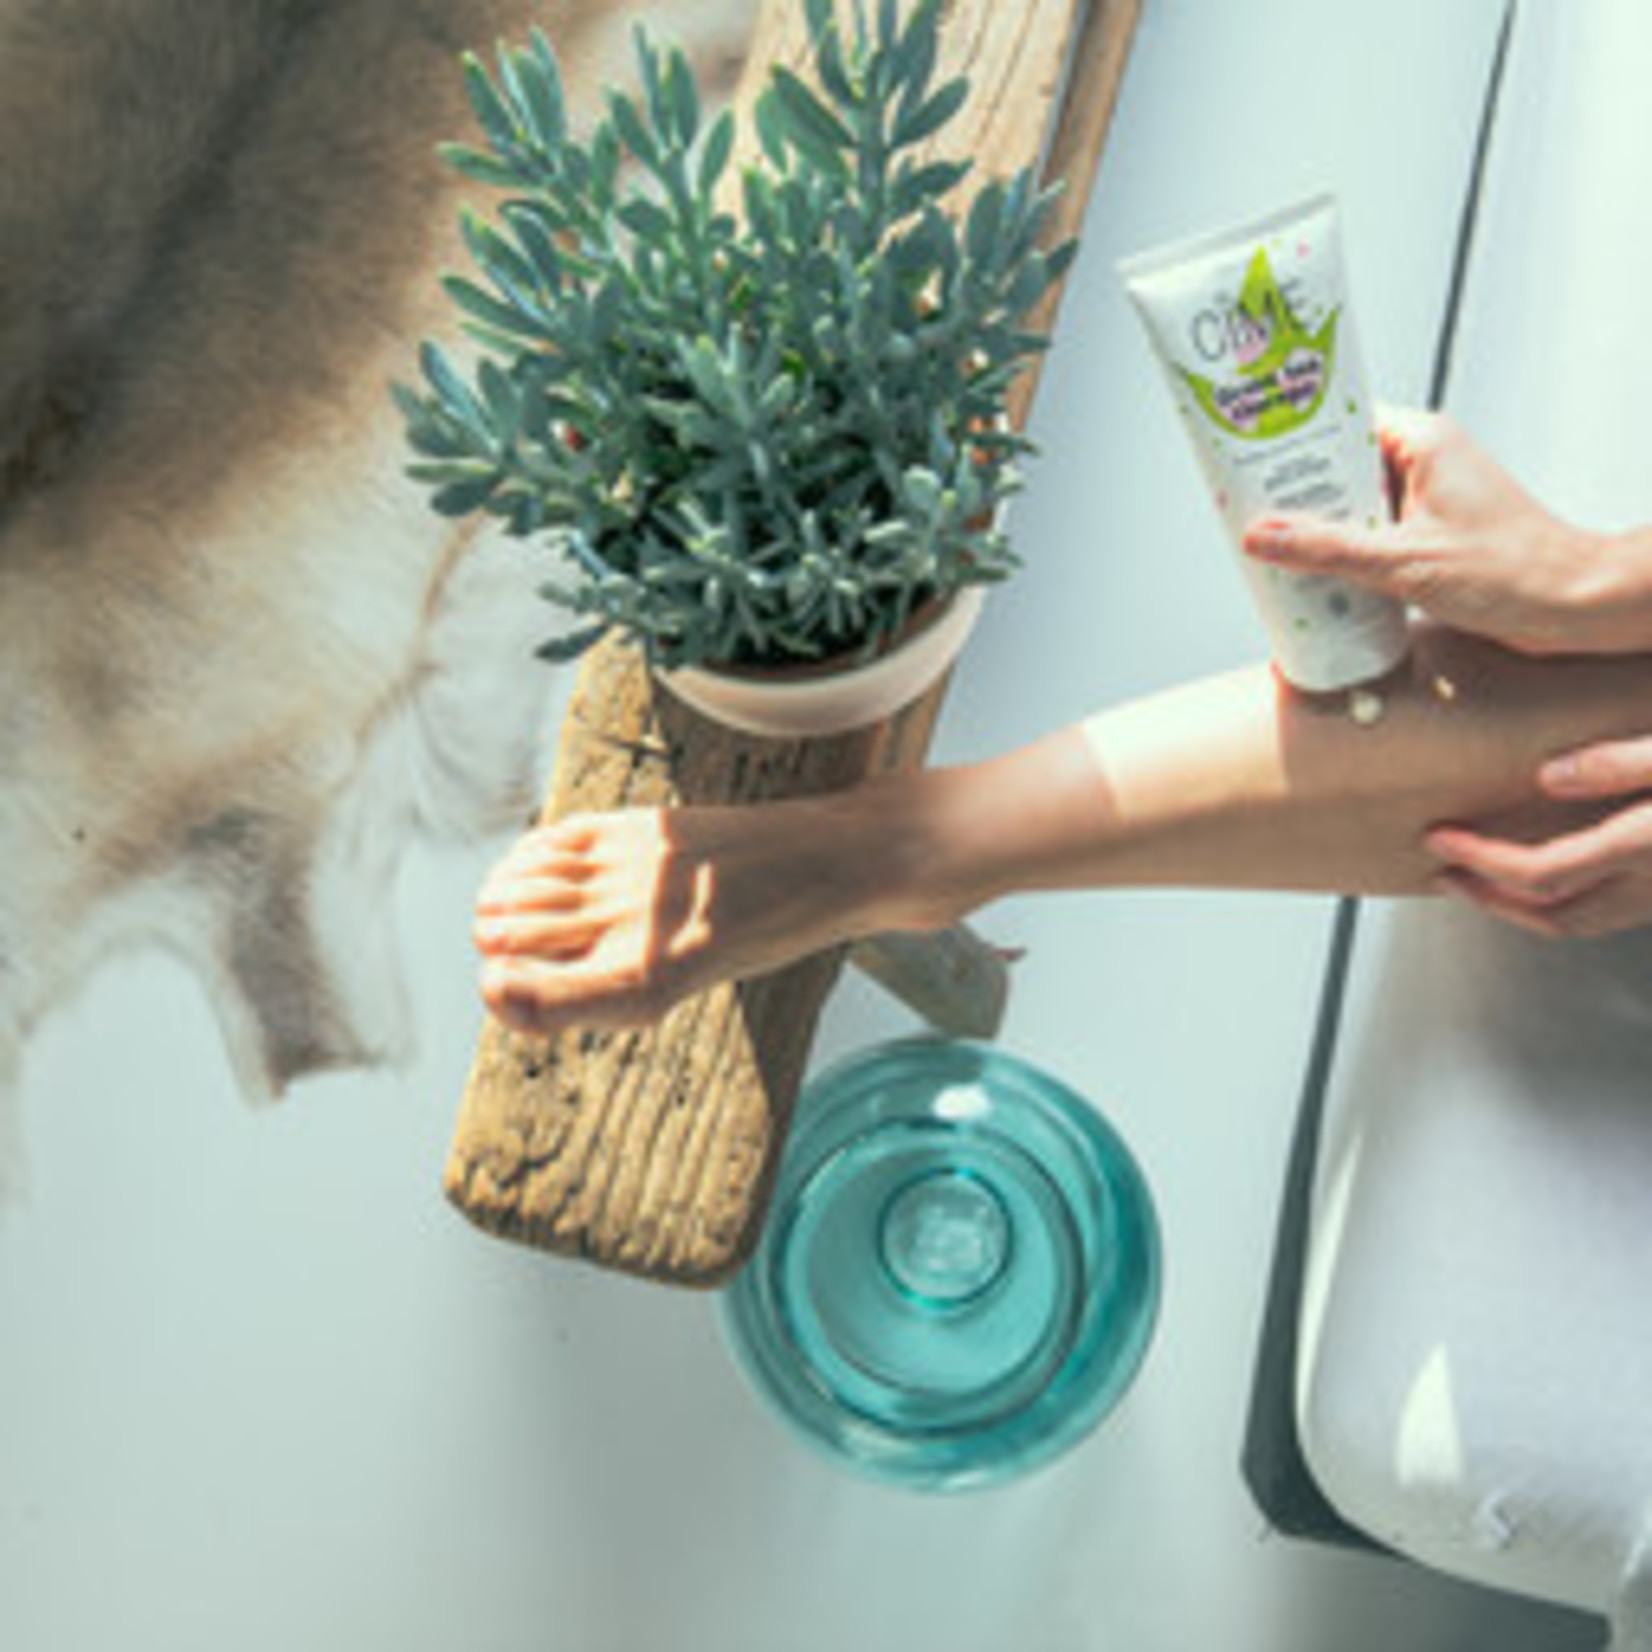 Cîme Verstevigende bodylotion - Green tea therapy